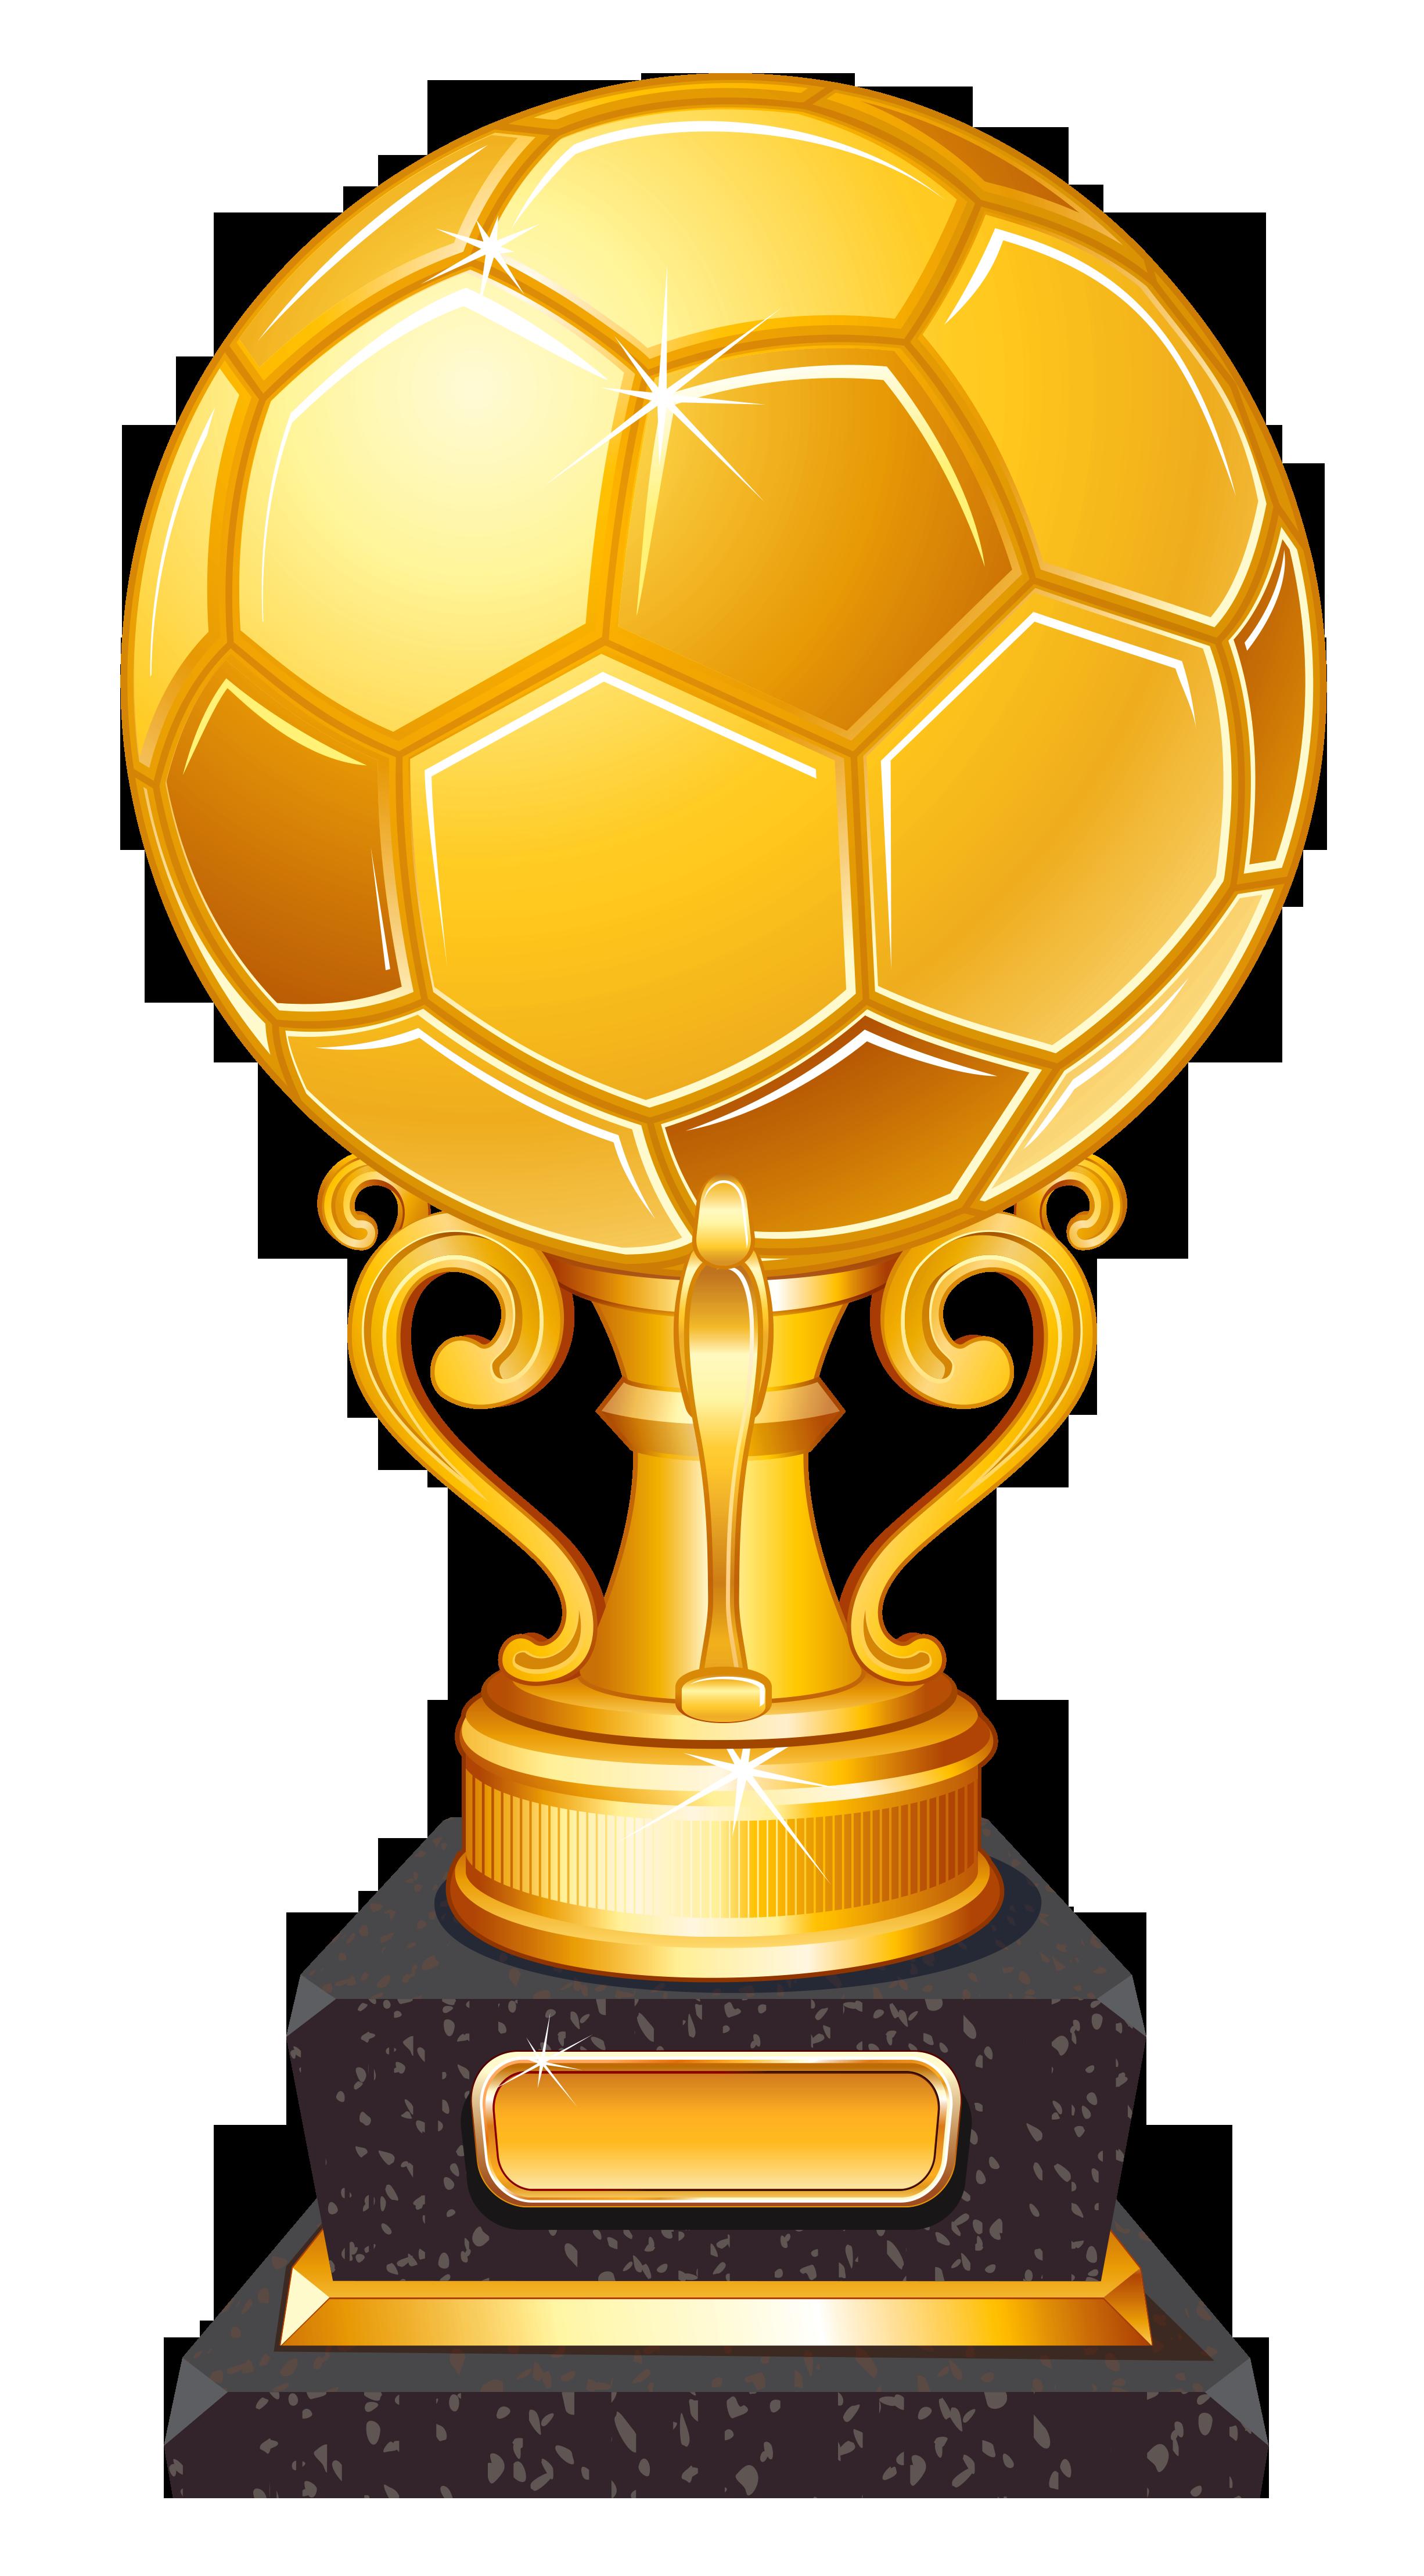 Gold Football Award Trophy Transparent PNG Clipart.